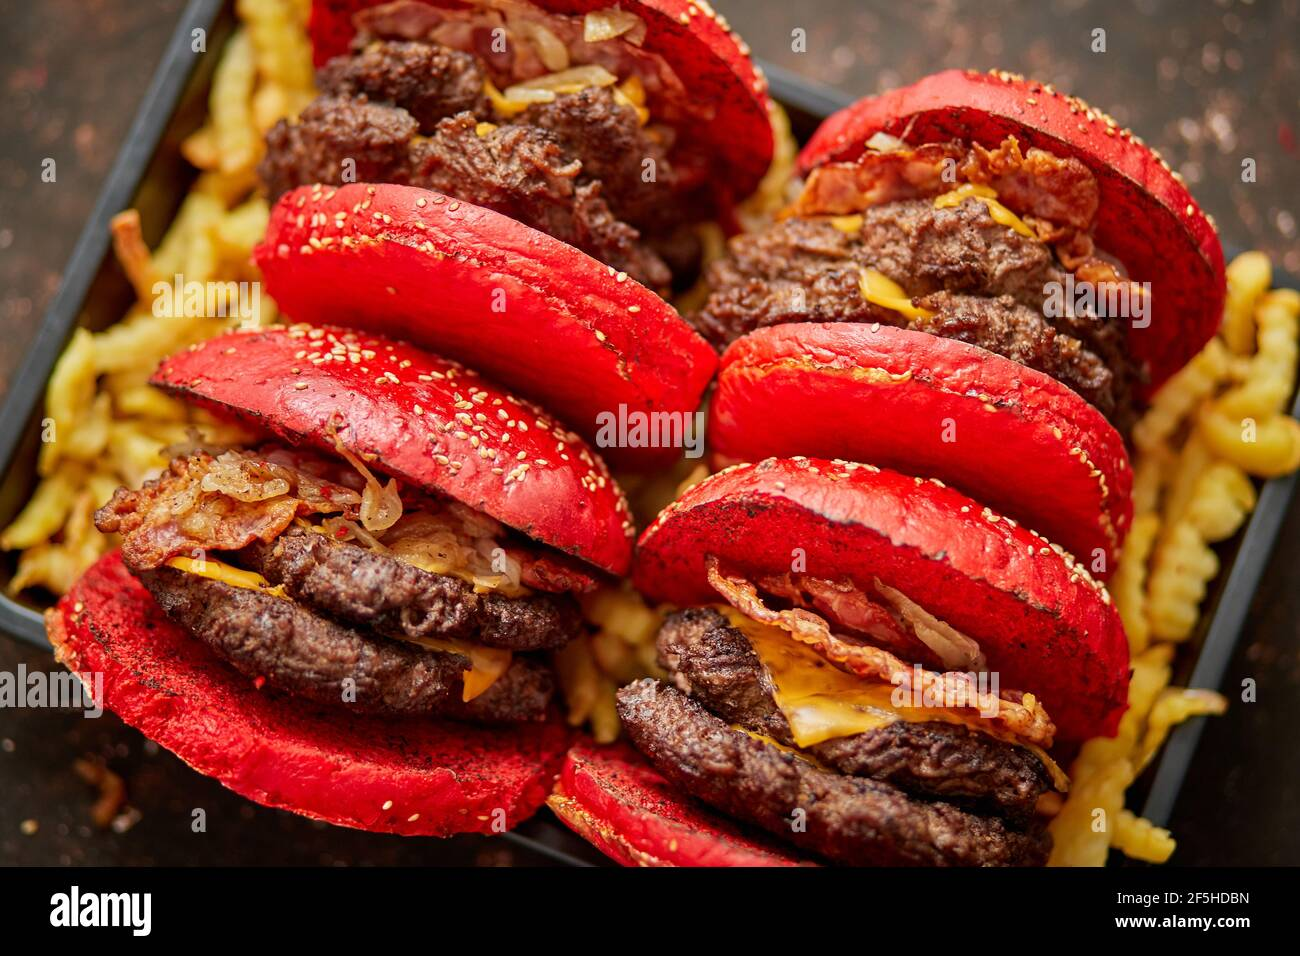 Juego de cuatro hamburguesas de queso de becon doble gigante caseras. Se sirve con patatas fritas a bordo de madera. Foto de stock